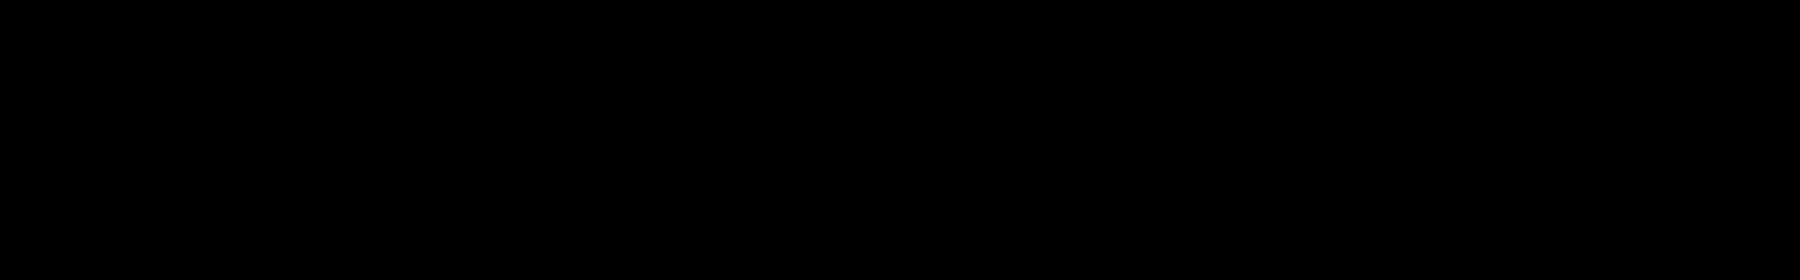 LO-FI Electronica 2 audio waveform